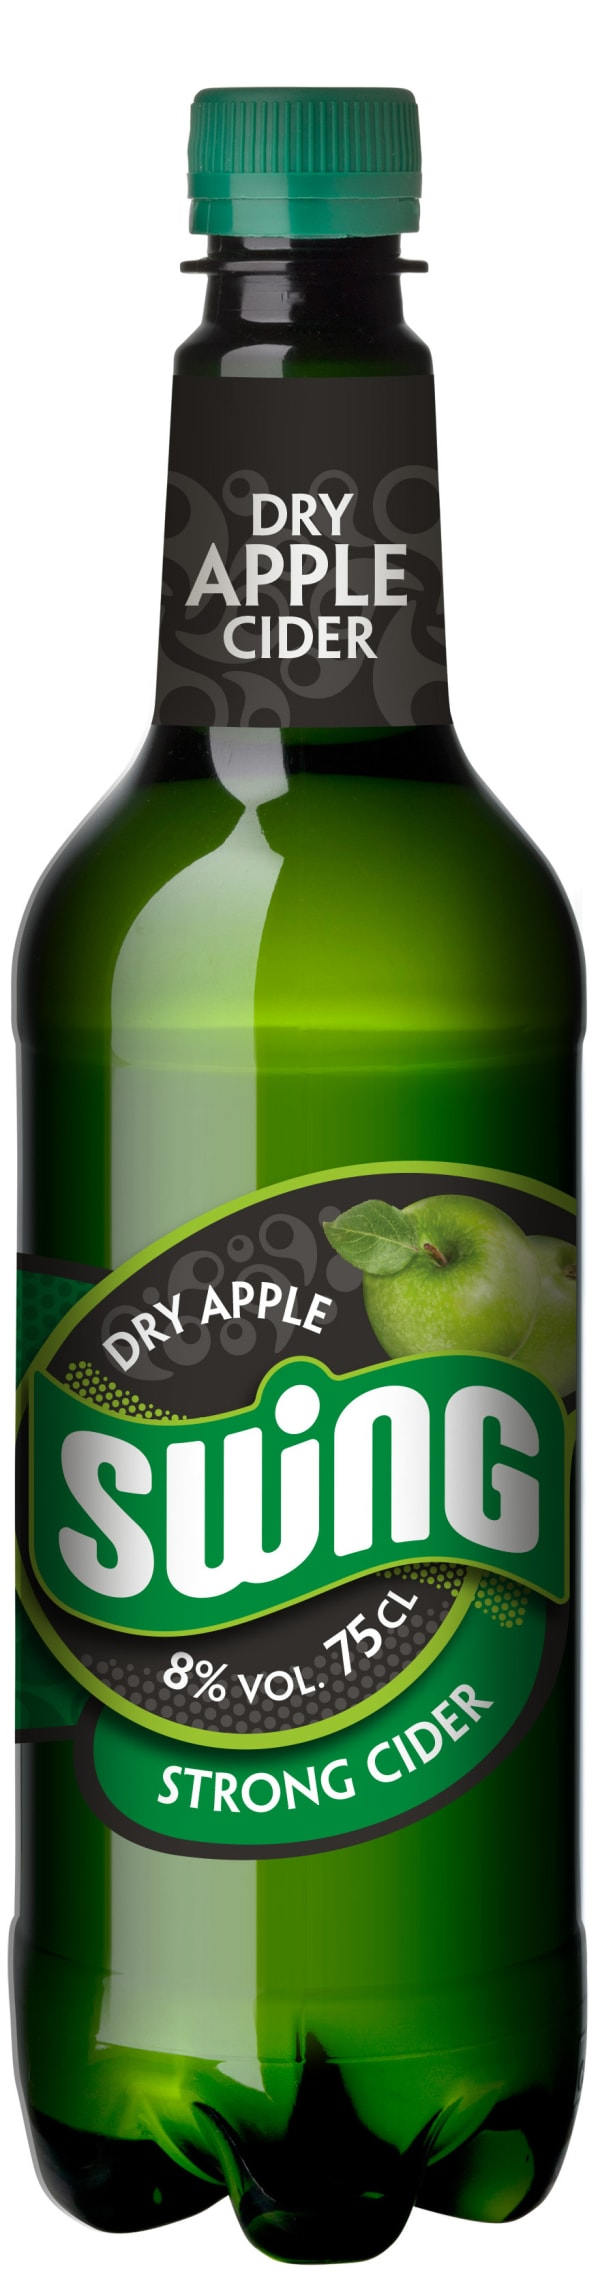 Swing Dry Apple Strong Cider muovipullo